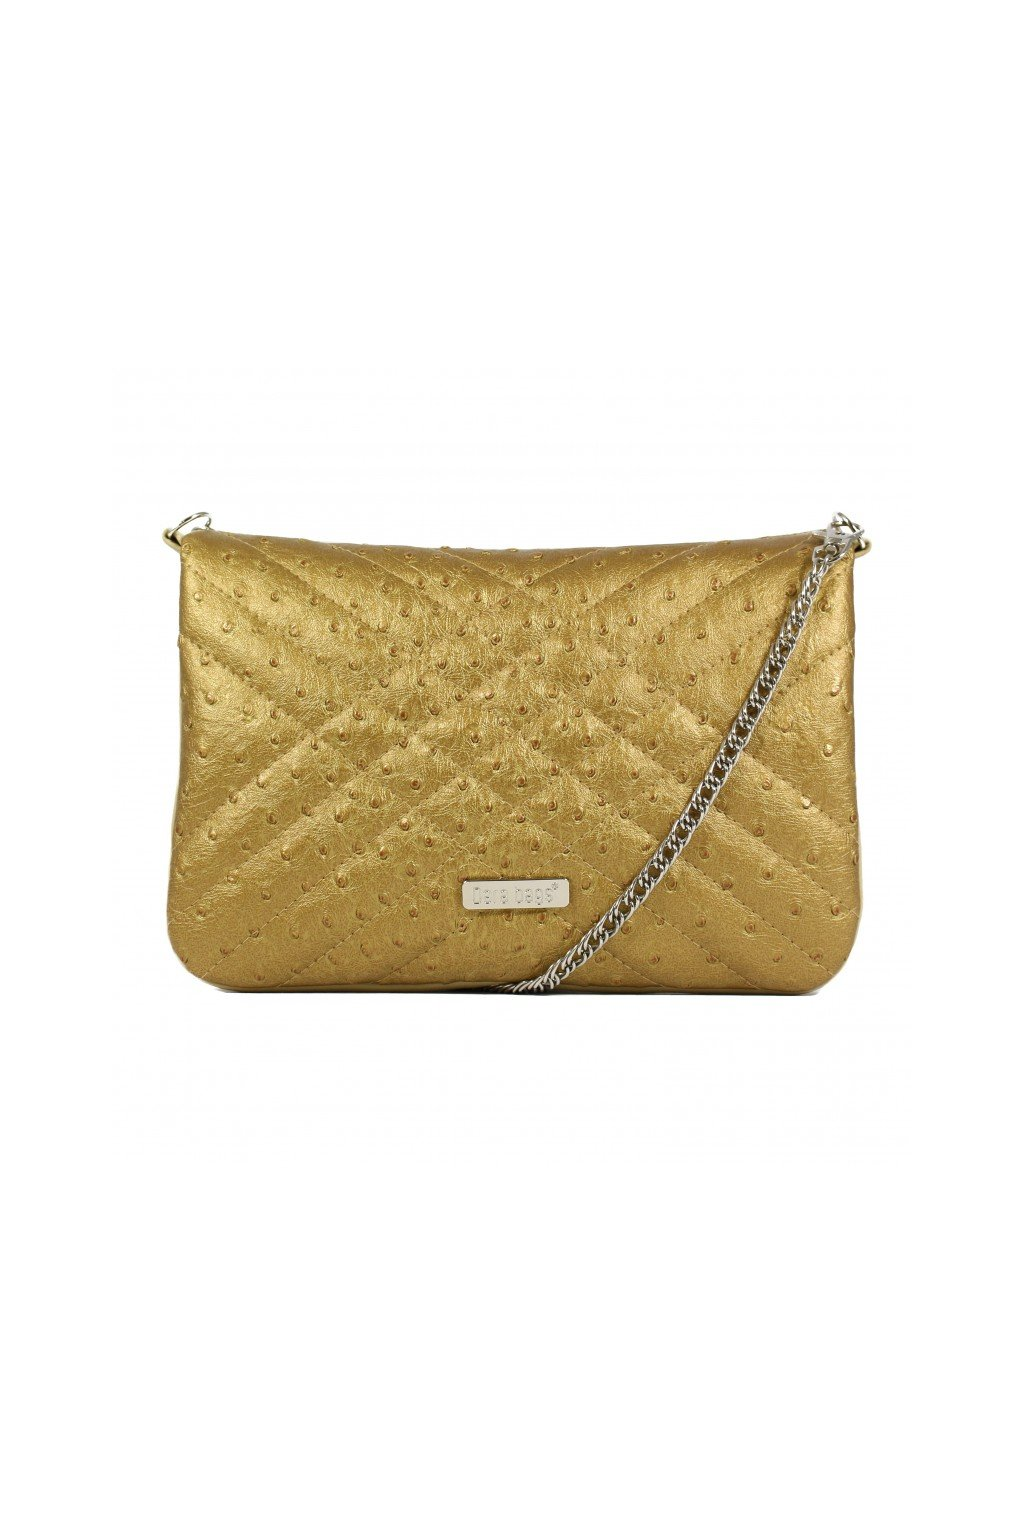 Třpytivá malá kabelka Cocktail Chick Dara bags zlatá 1